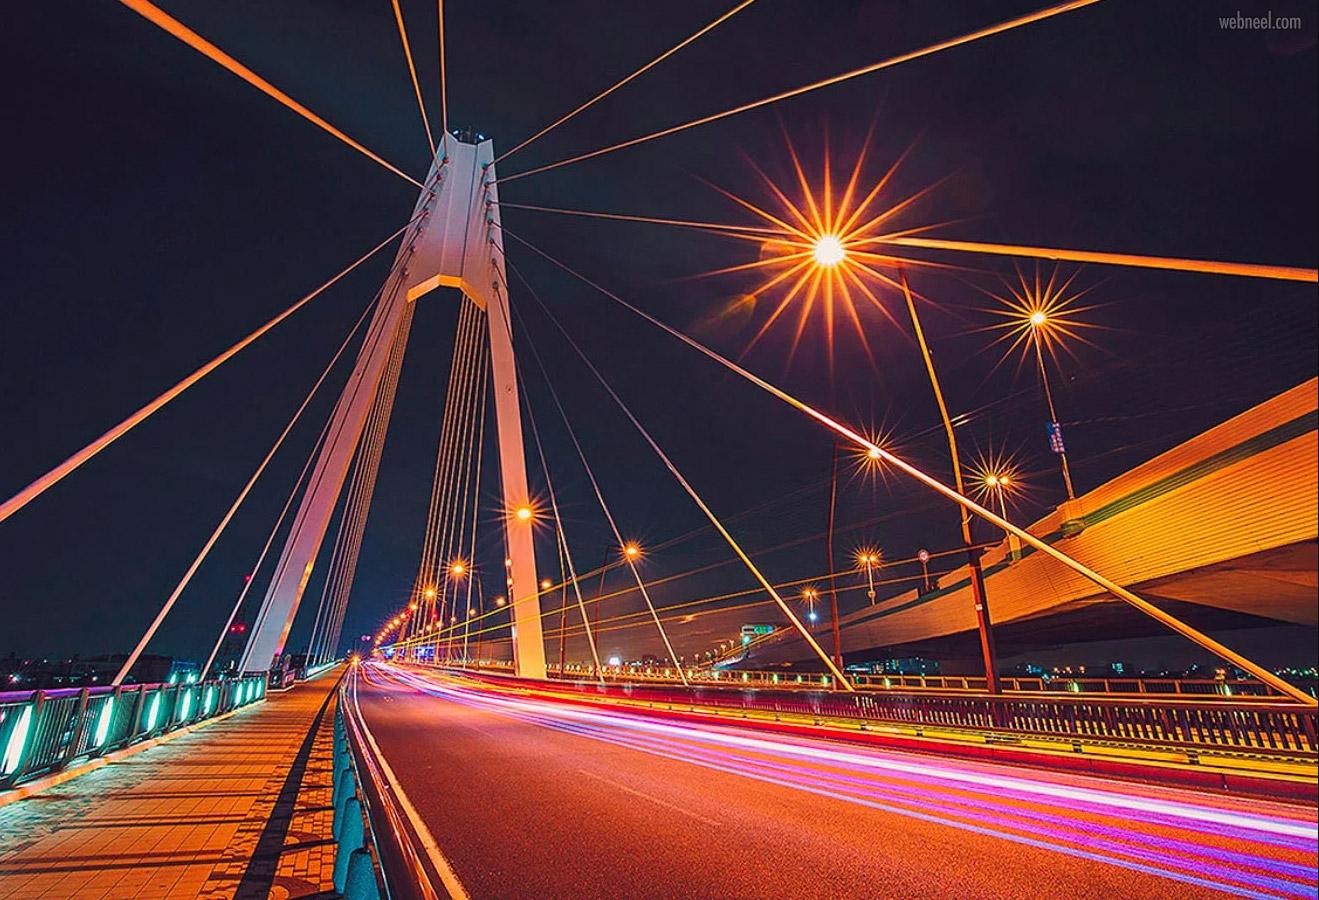 night city photography